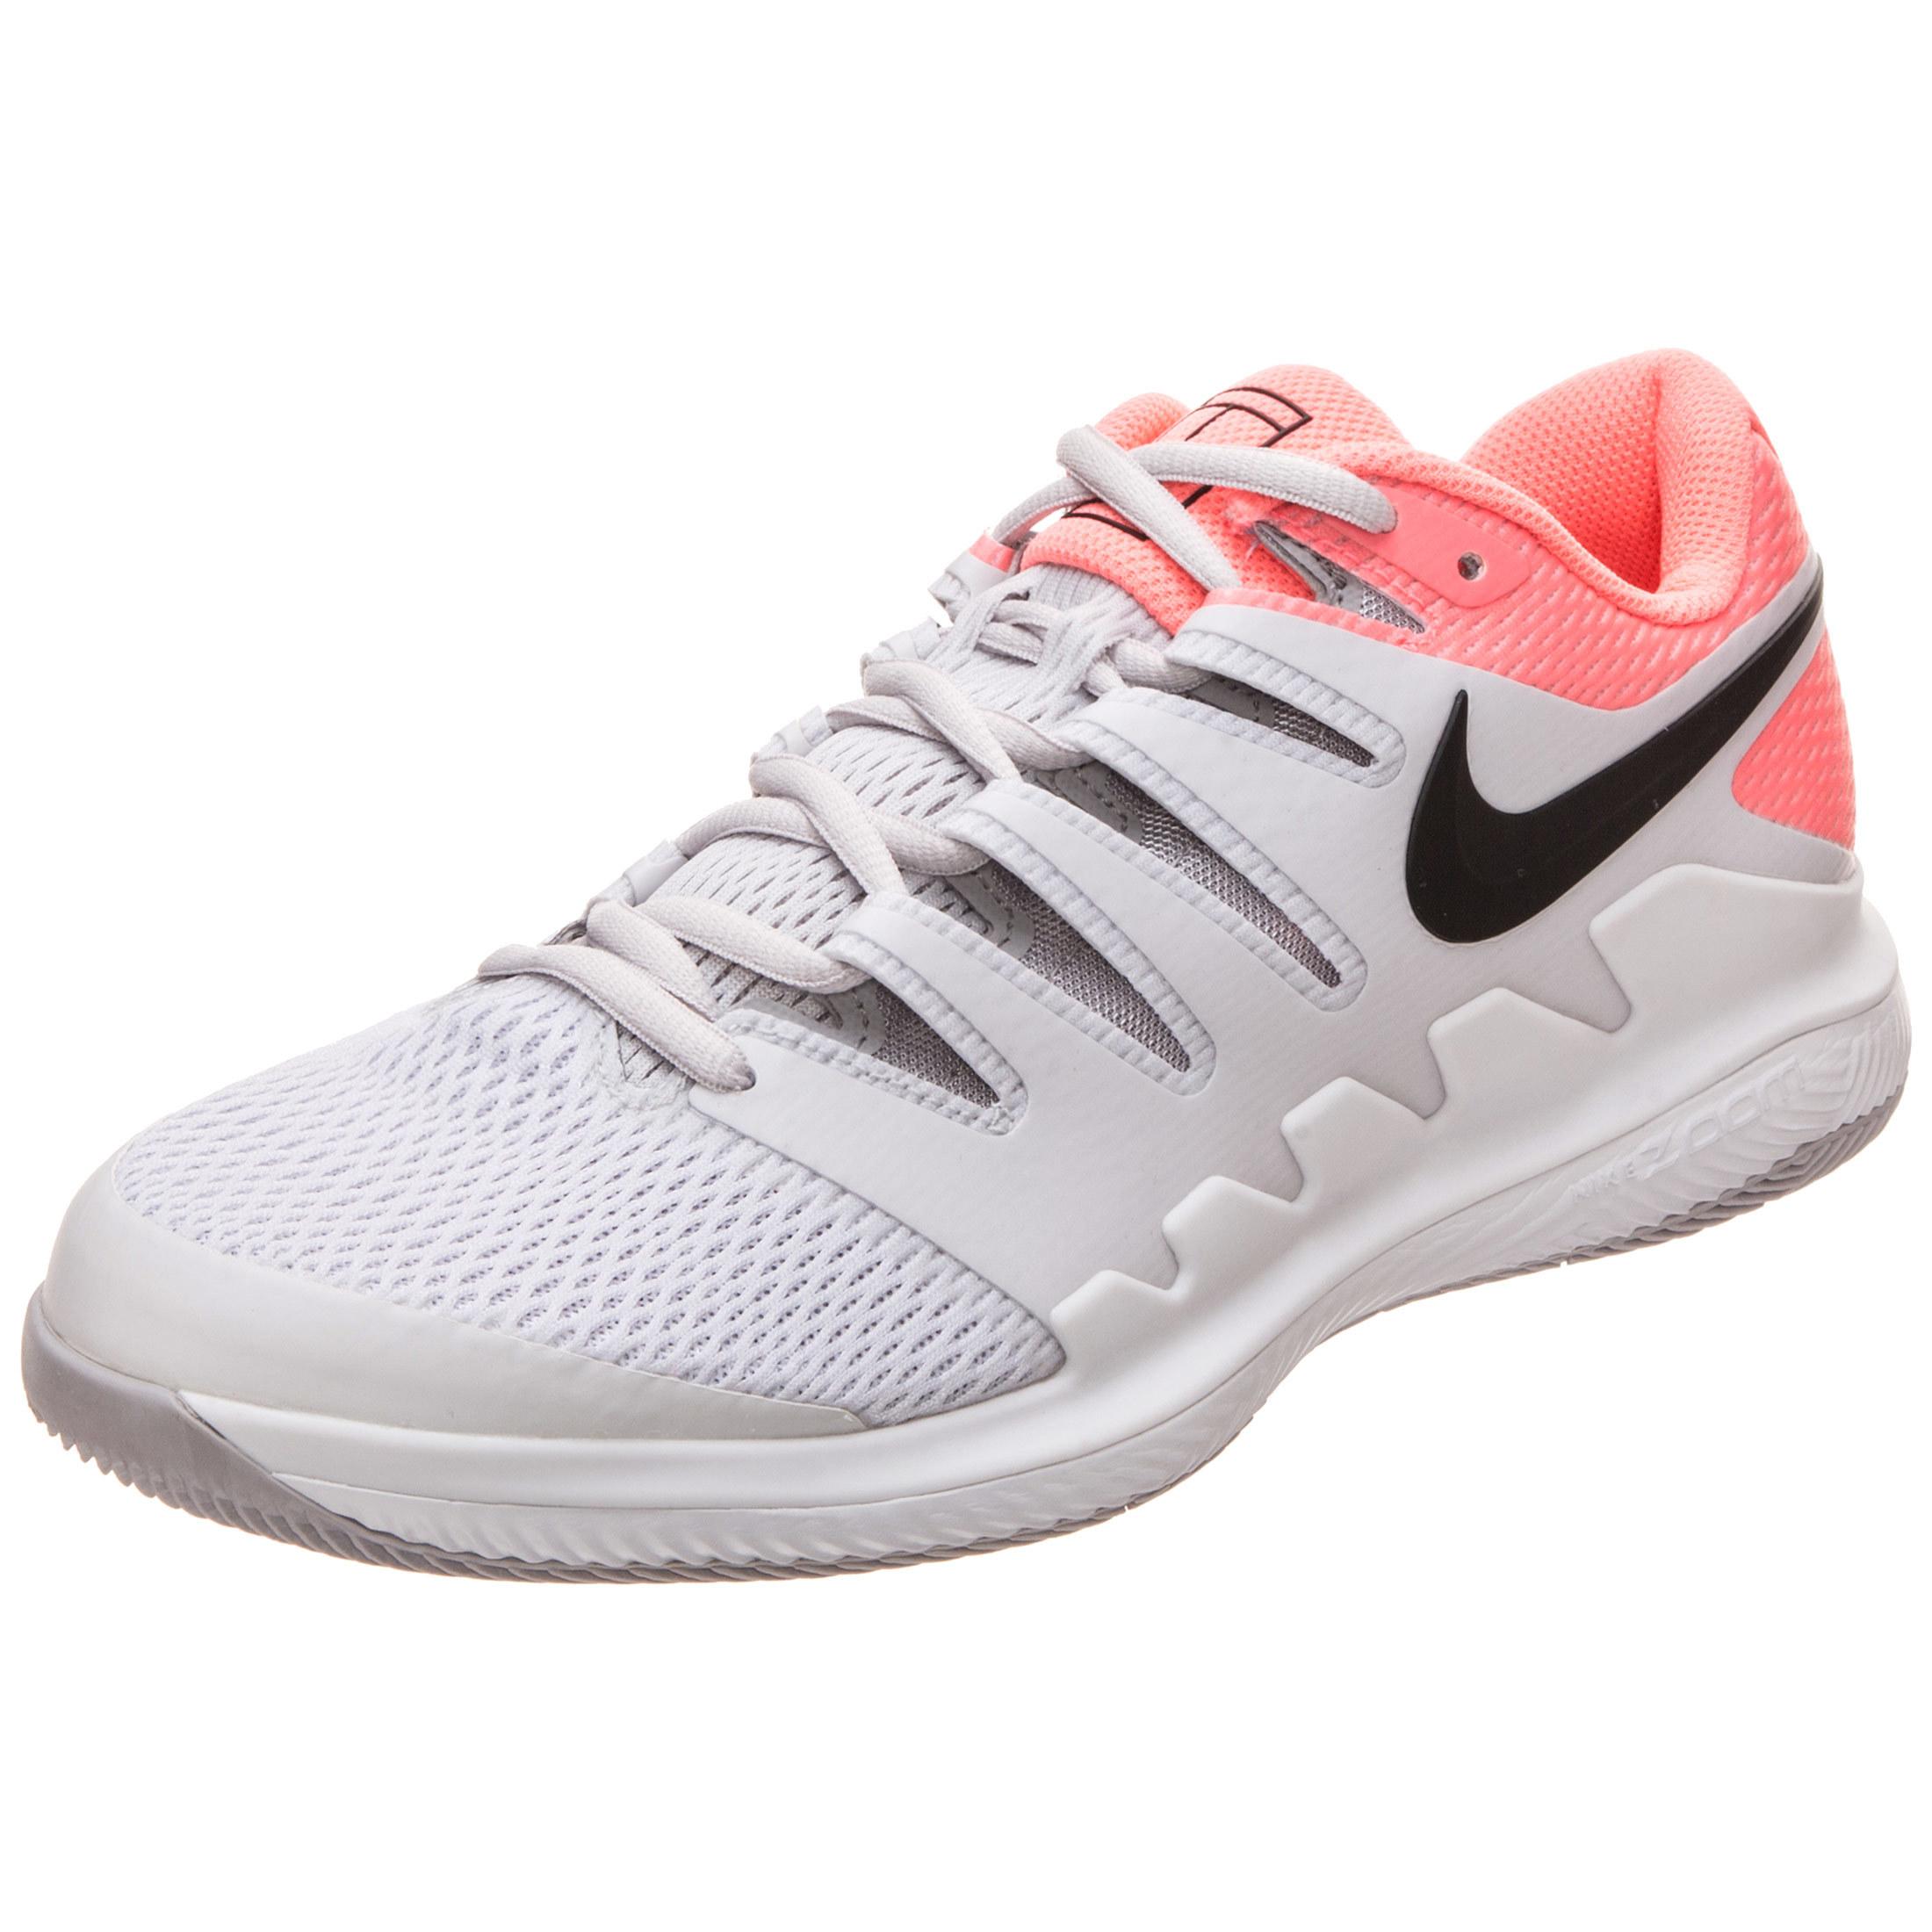 the latest cfe90 c51aa Nike Air Zoom Vapor X Women s Tennis Shoe - Grey   AA8027-001   FOOTY.COM